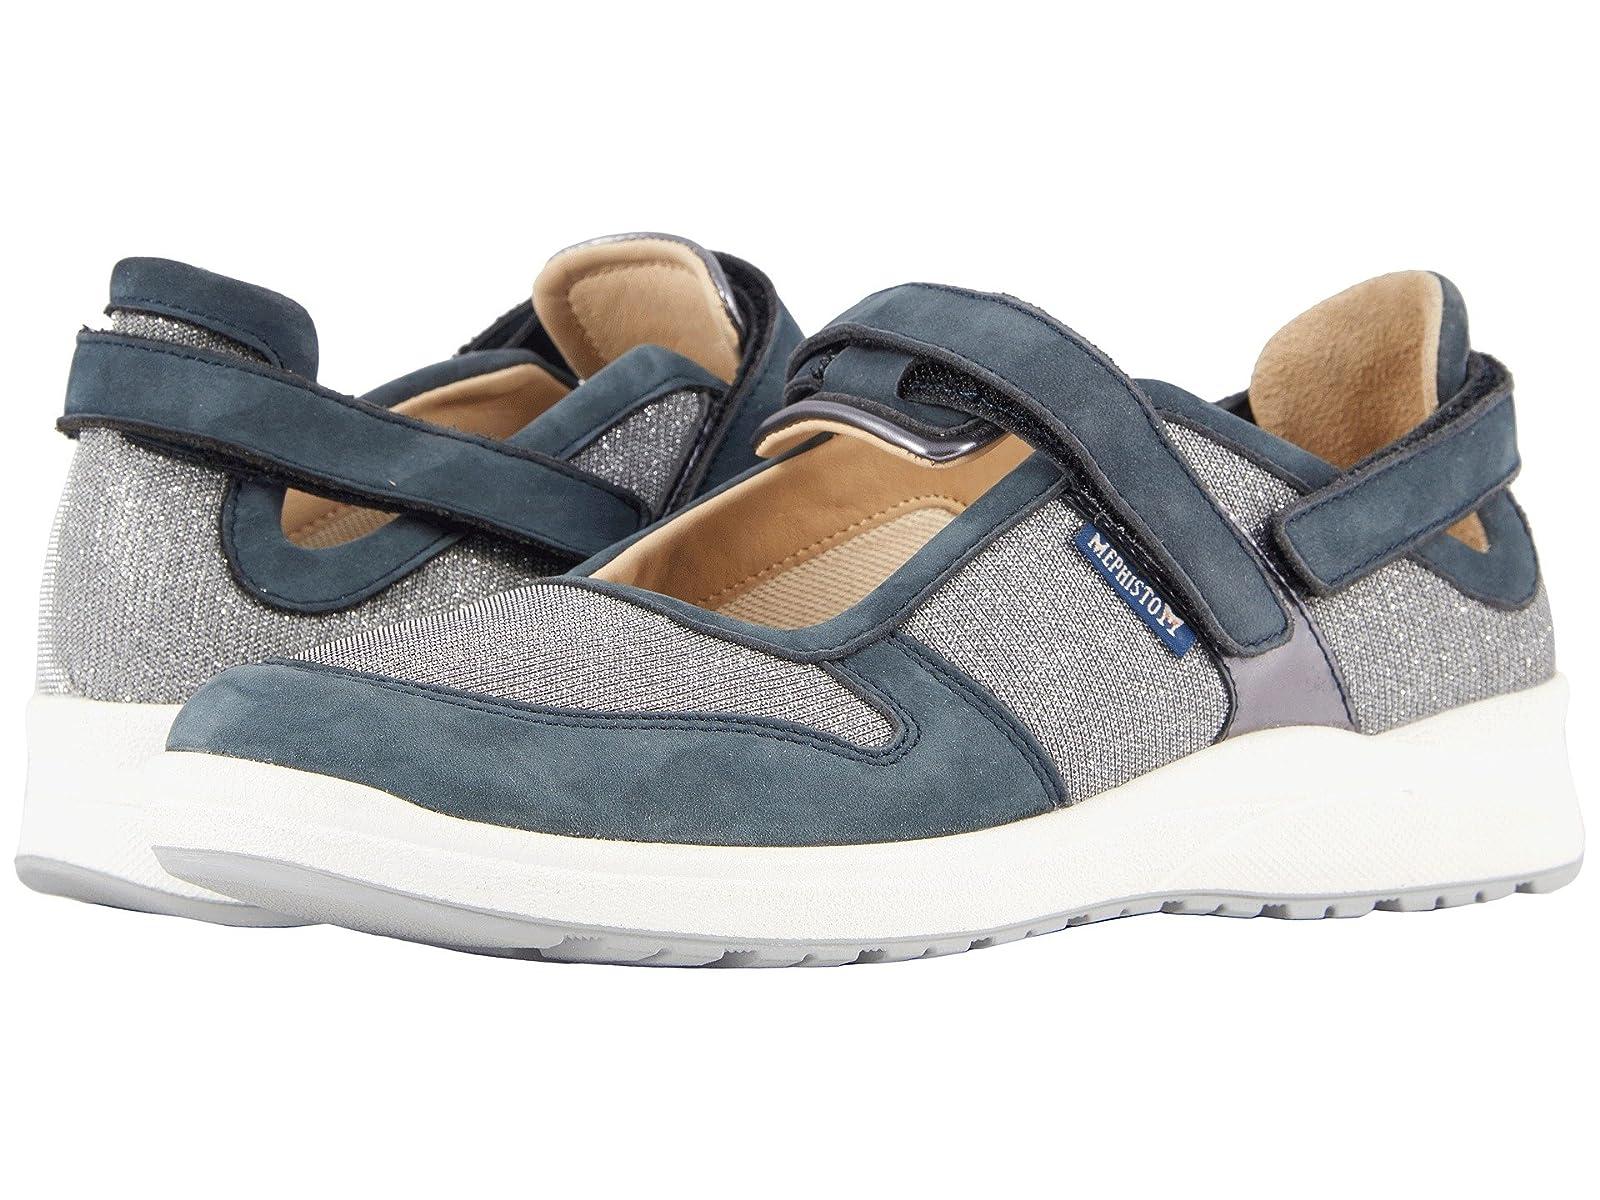 Mephisto RejineAtmospheric grades have affordable shoes